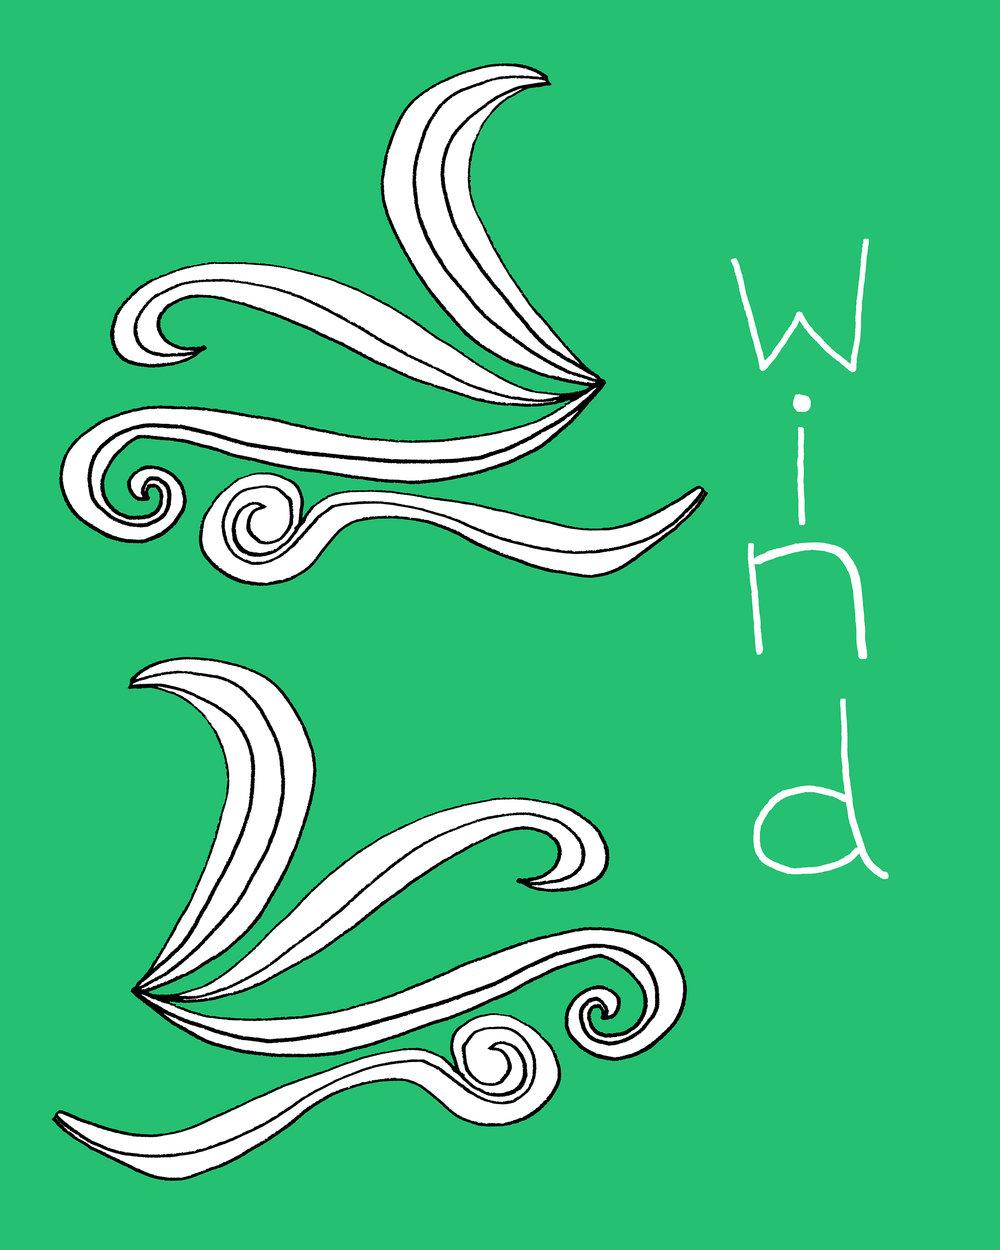 Wind_001 color_web.jpg